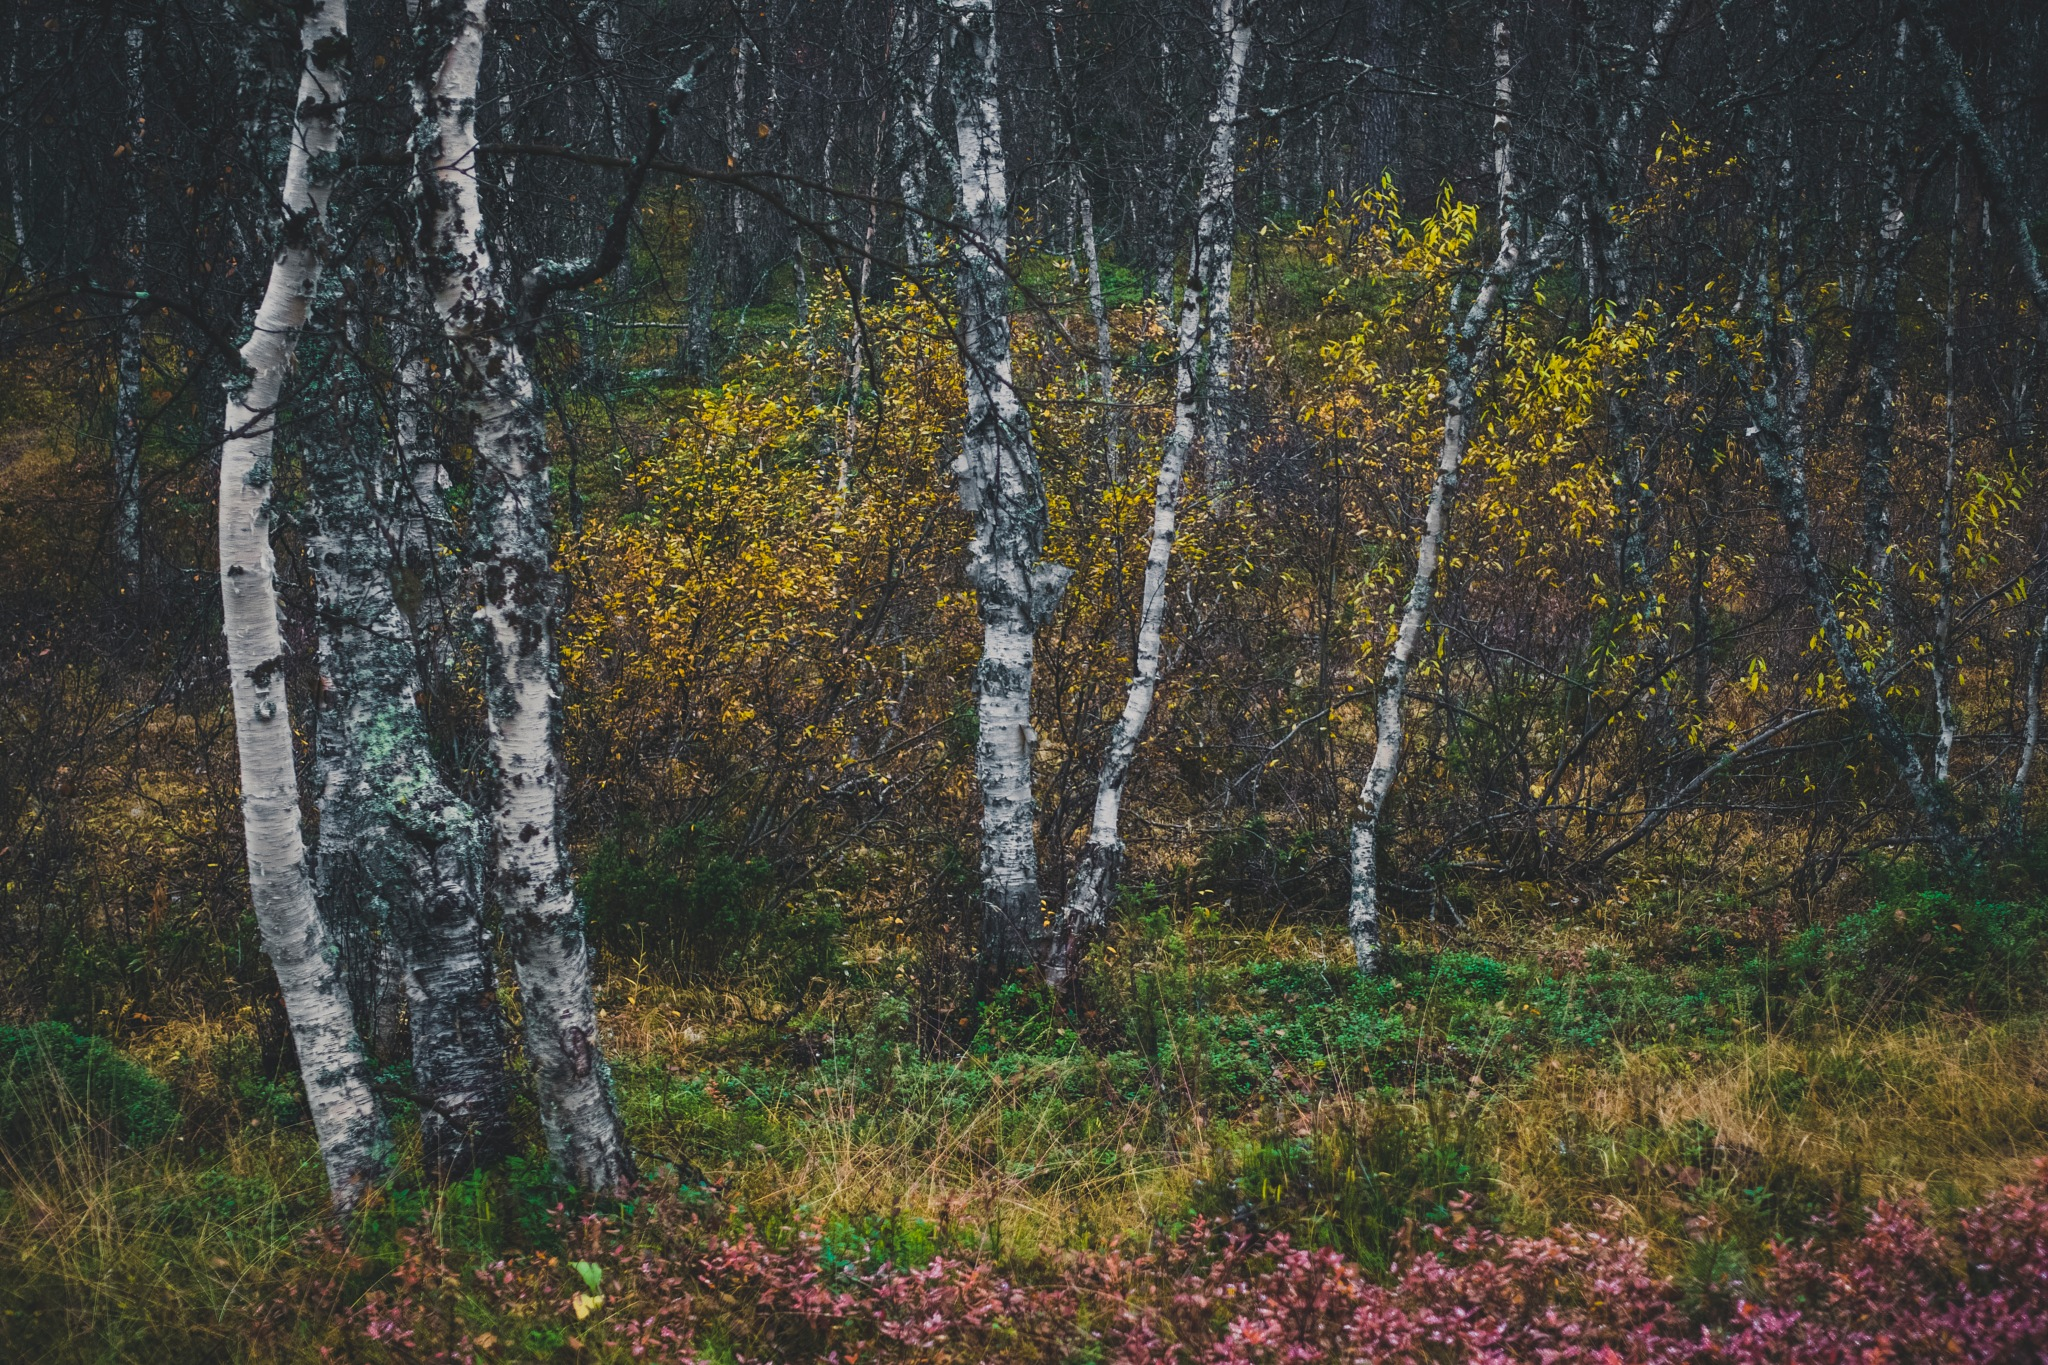 Autumn Woods II by Juuso Voutilainen